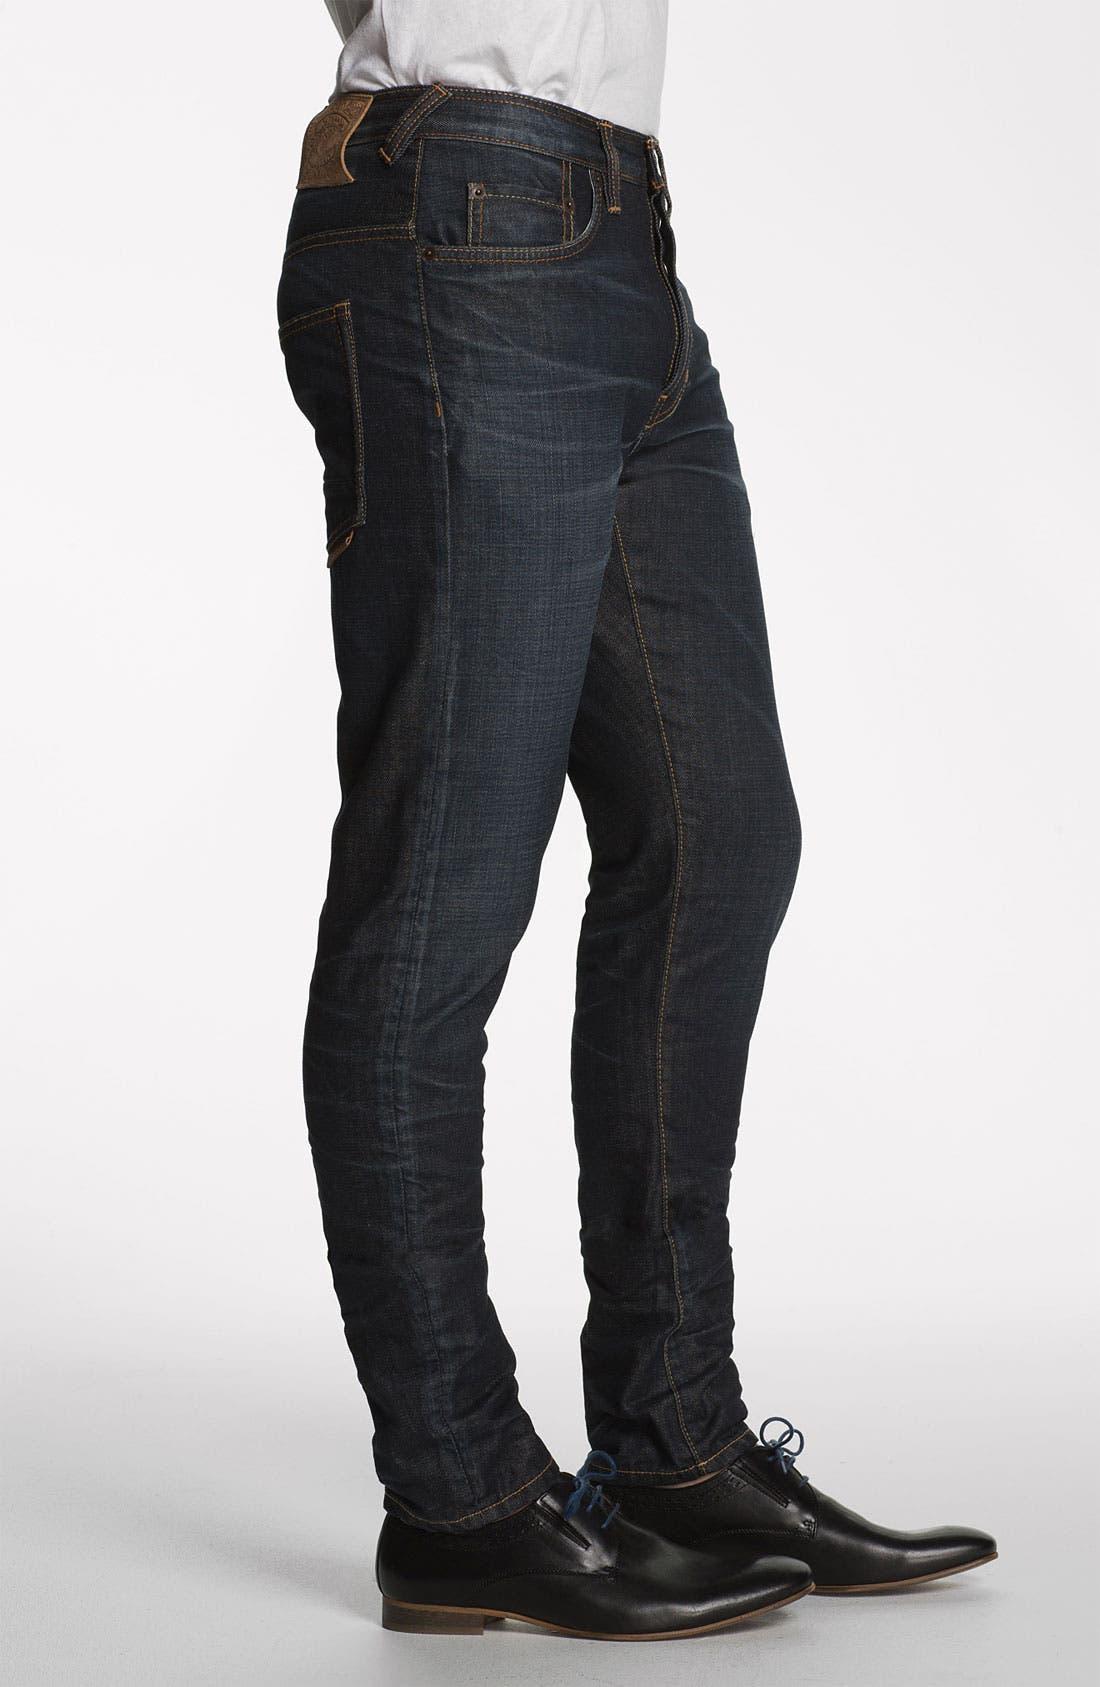 Alternate Image 3  - Natural Selection Denim 'Bruised' Slim Carrot Fit Jeans (Blue Rain)